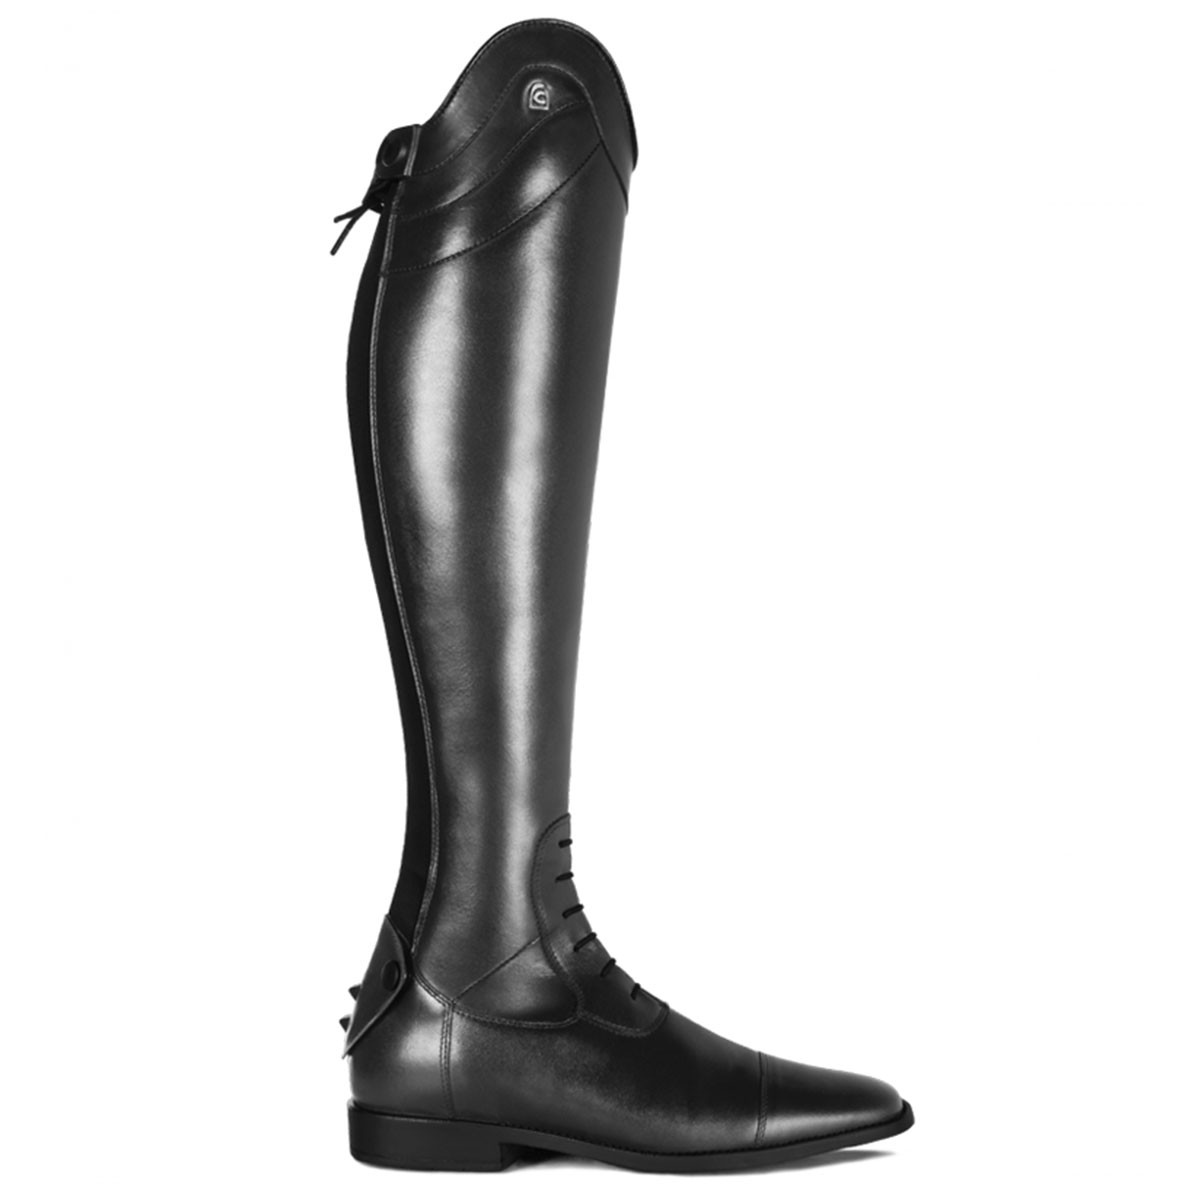 Cavallo Linus Slim rijlaars zwart maat:6-6.5 / h48-w34